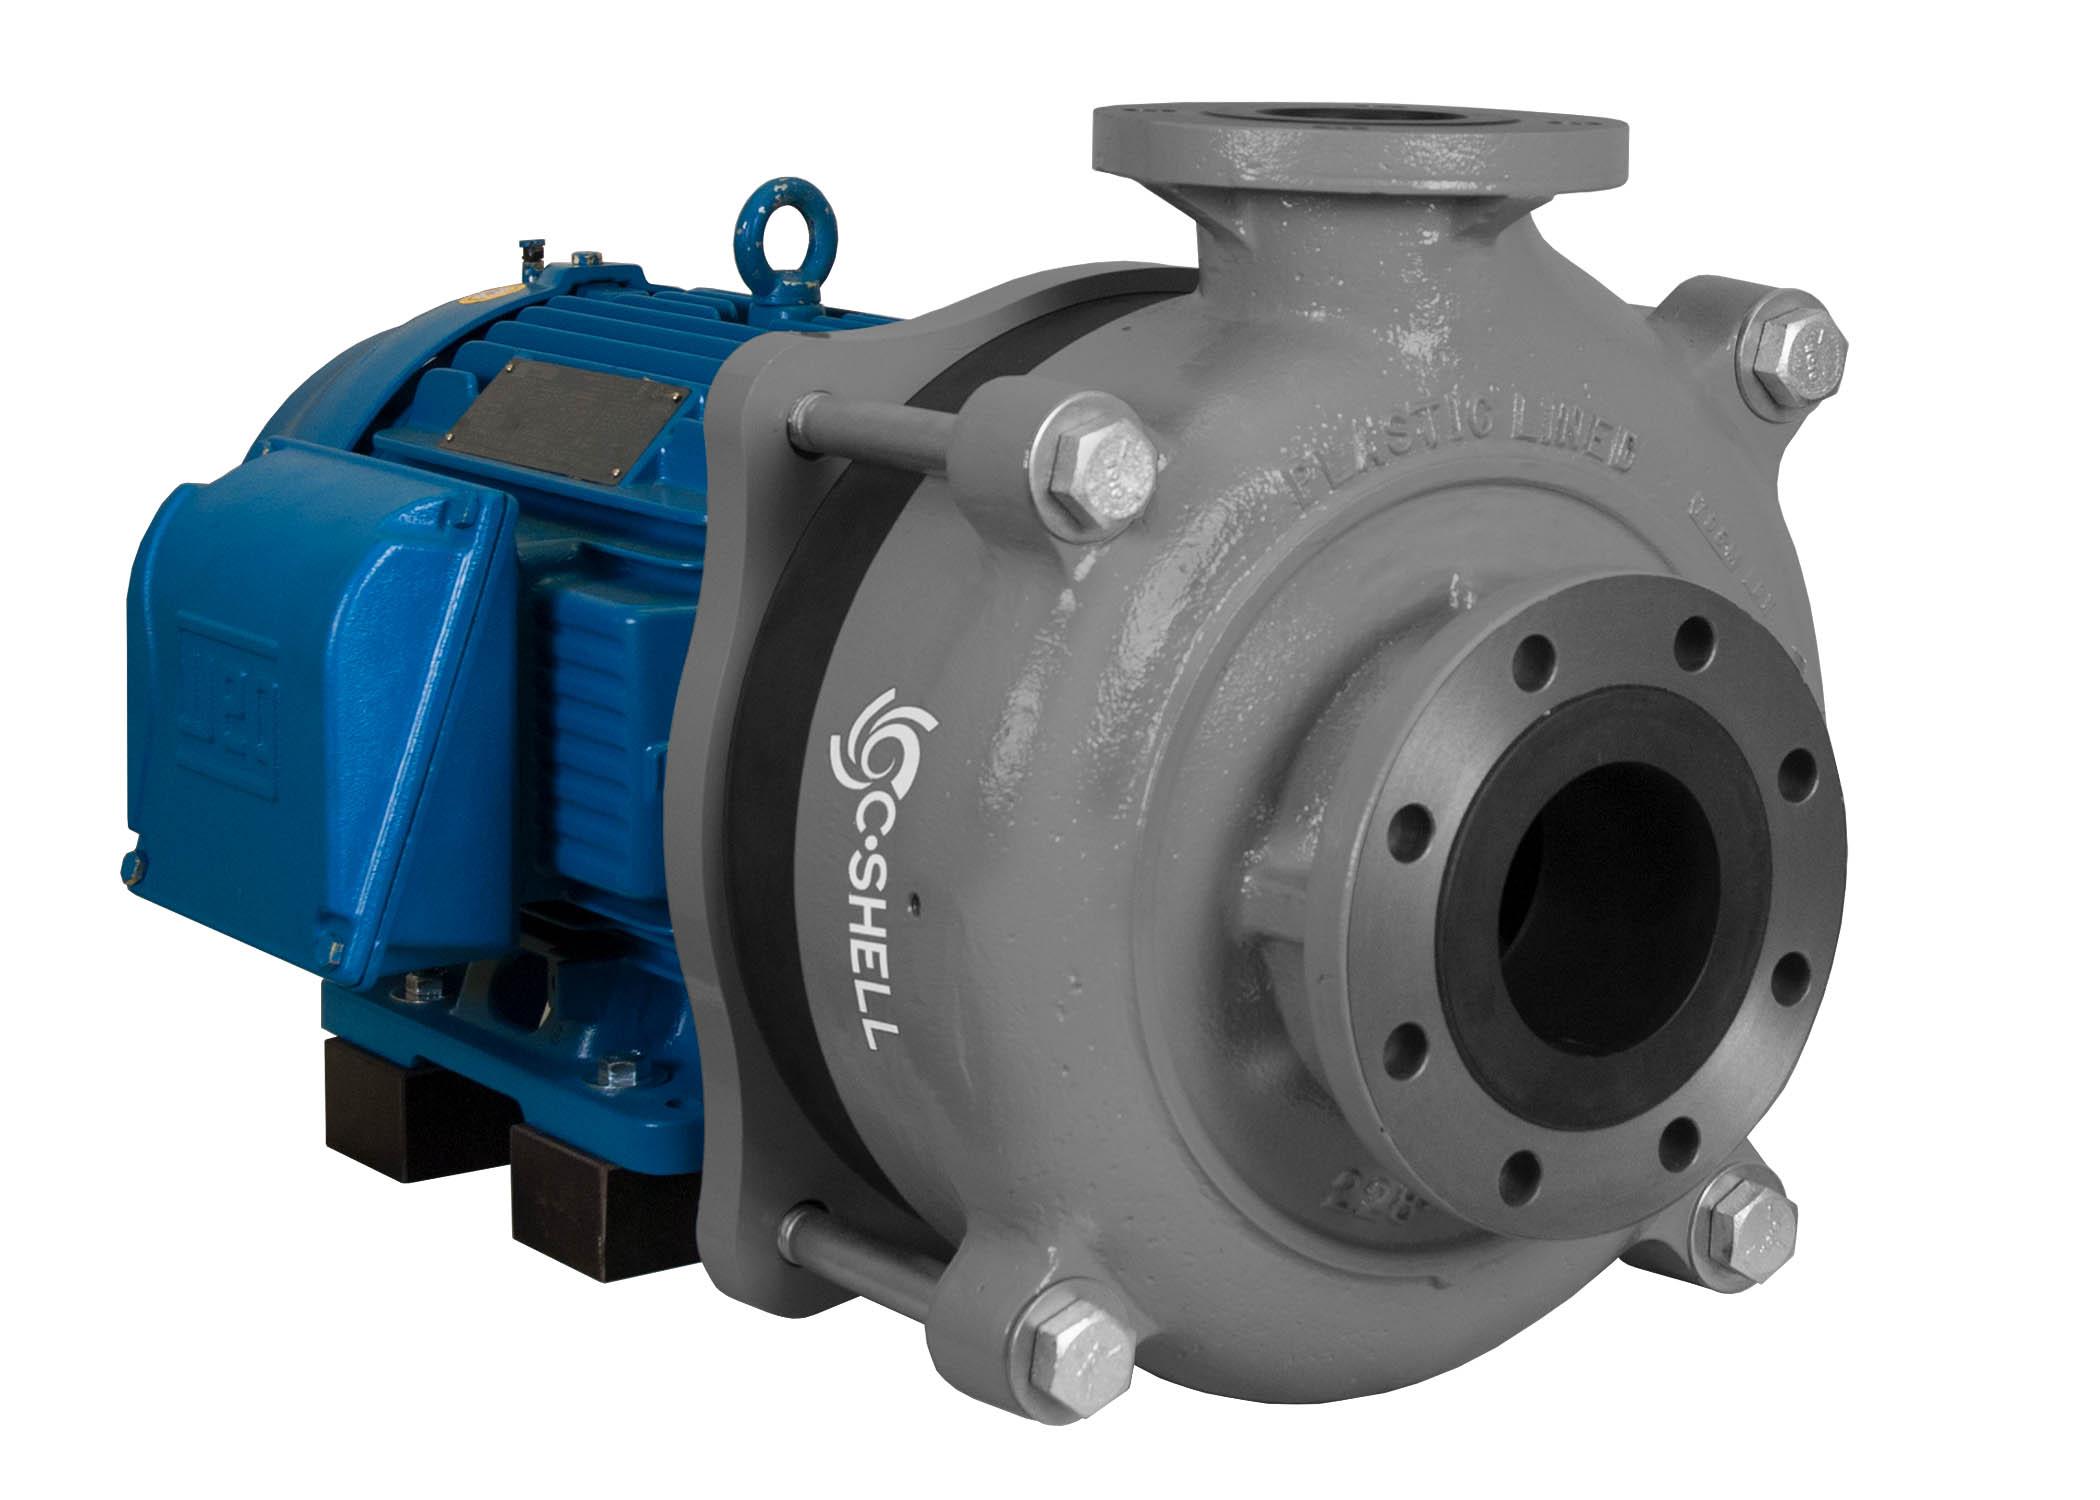 C-Shell 4x3-10 Pump with blue WEG Motor left angle view